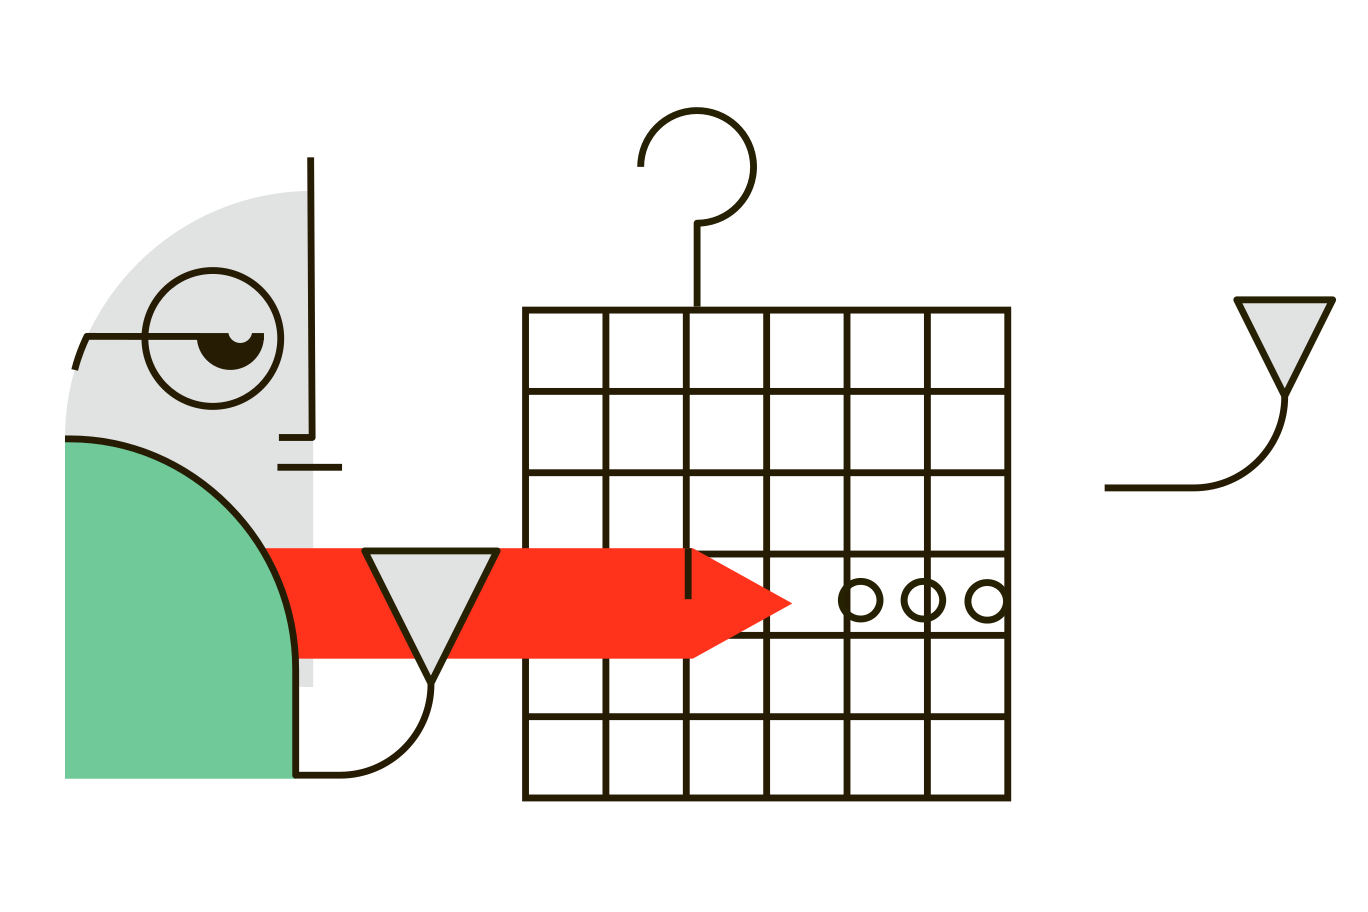 FAQ Clipart illustration in PNG, SVG